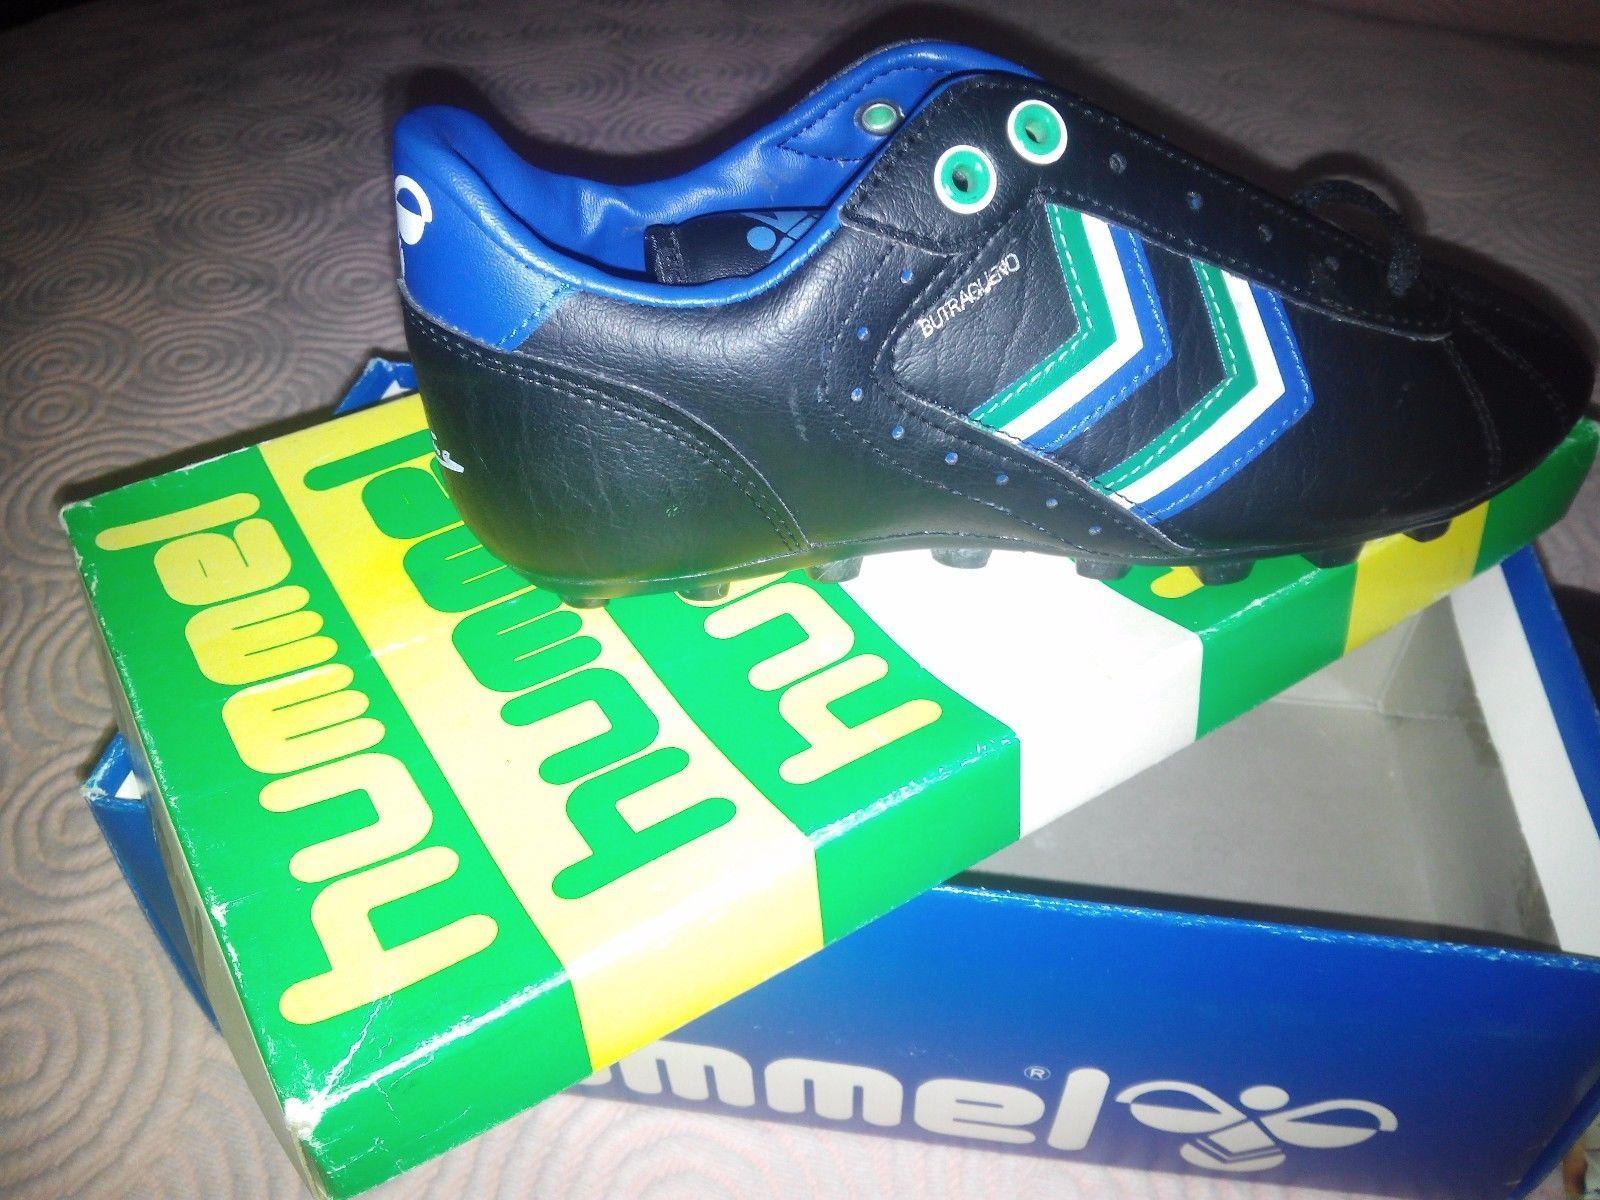 new concept 096ef e47cb Botas fútbol Butragueño Hummel Real Madrid nuevas boots football retro 80 s    eBay